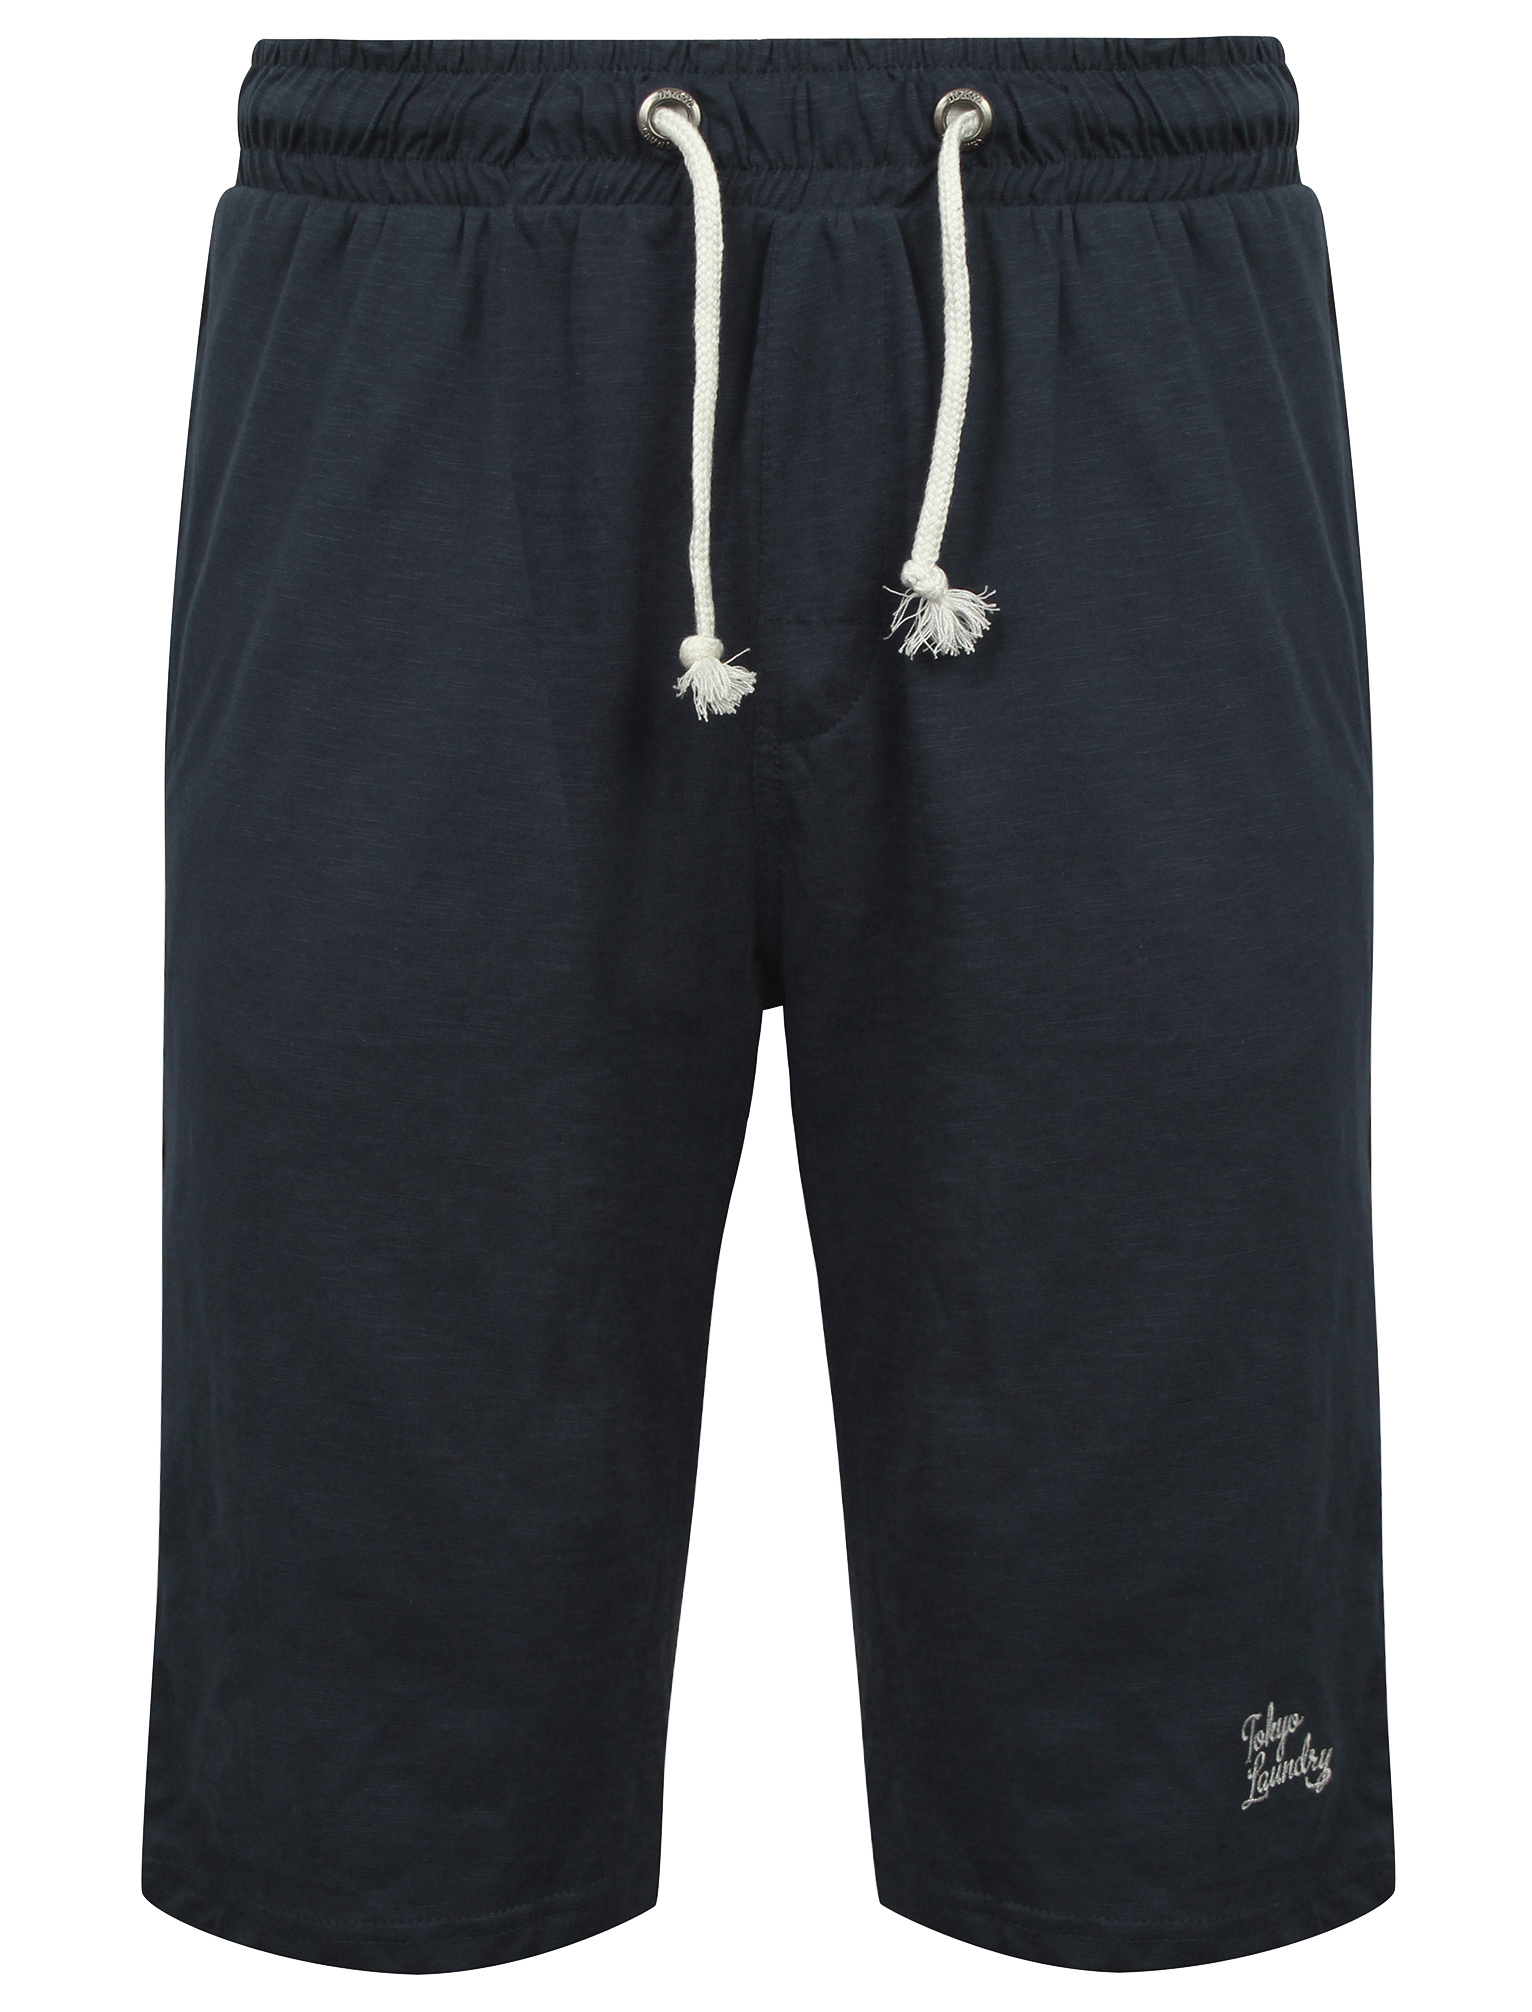 Tokyo-Laundry-Men-039-s-Gough-Cotton-Short-Sleeve-Pyjamas-PJ-Shorts-Lounge-Wear-Set thumbnail 5